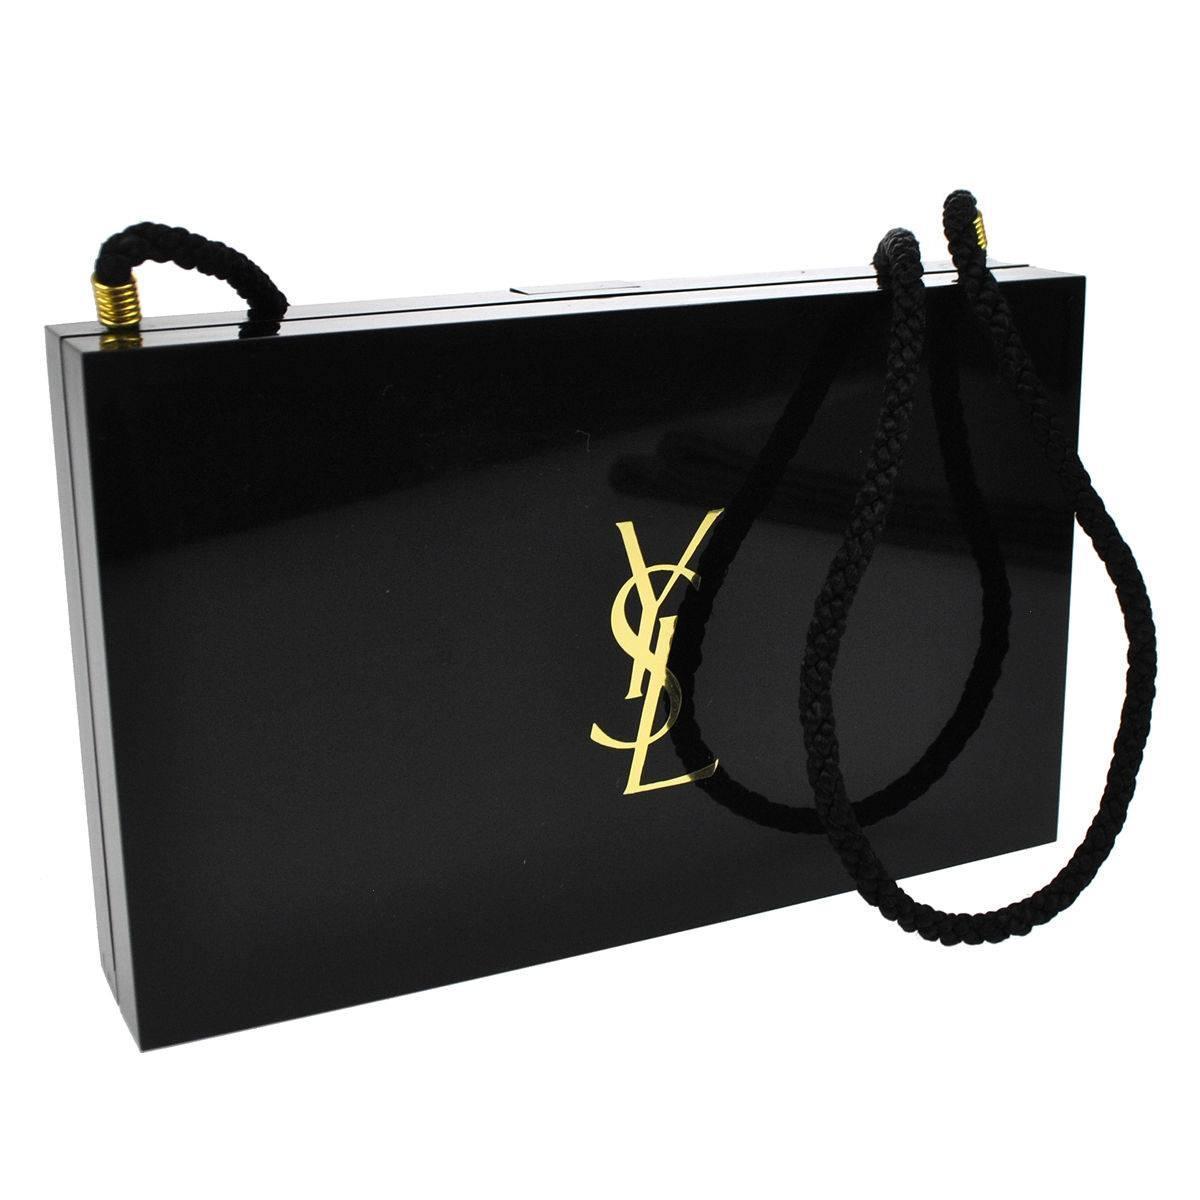 38ce8ccecc6 Yves Saint Laurent YSL Black Gold Compact Cosmetic Case Evening Shoulder  Clutch